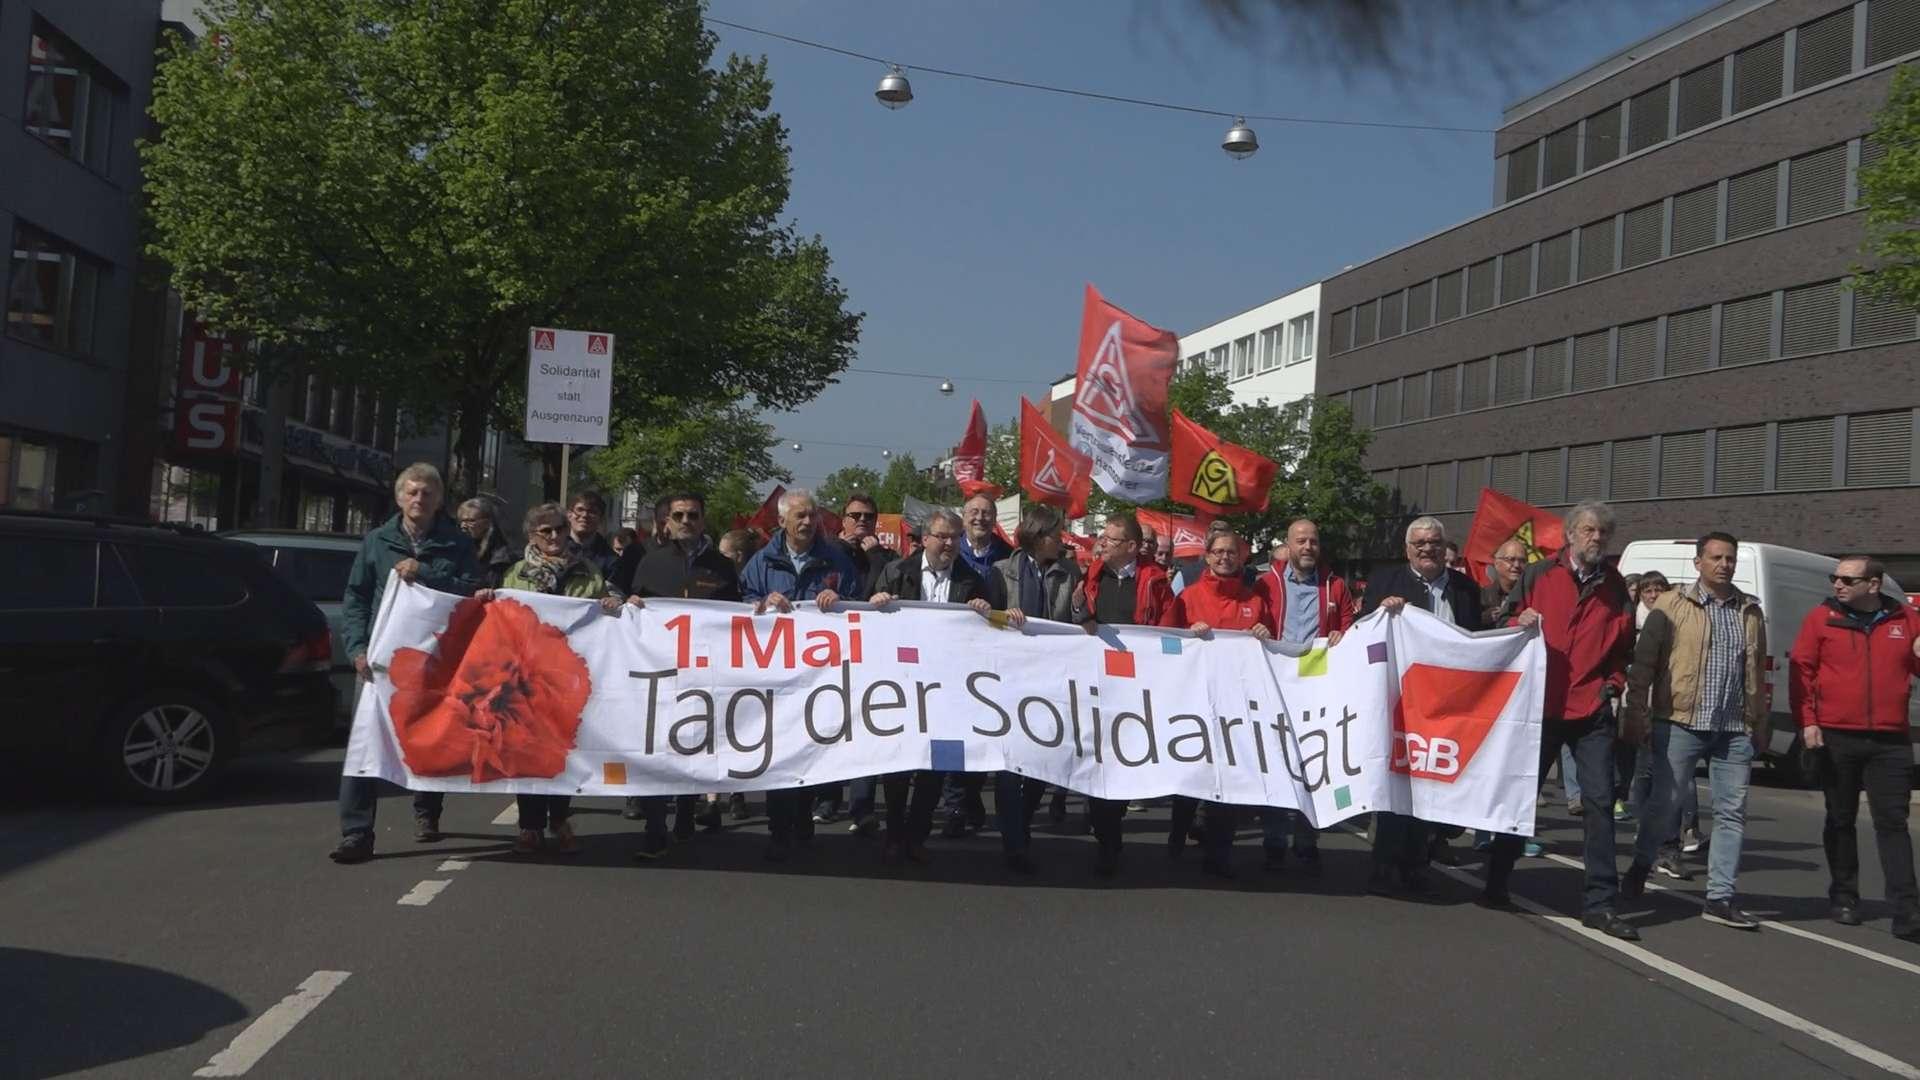 Dreharbeiten DGB Kundgebung 1 Mai Hannover